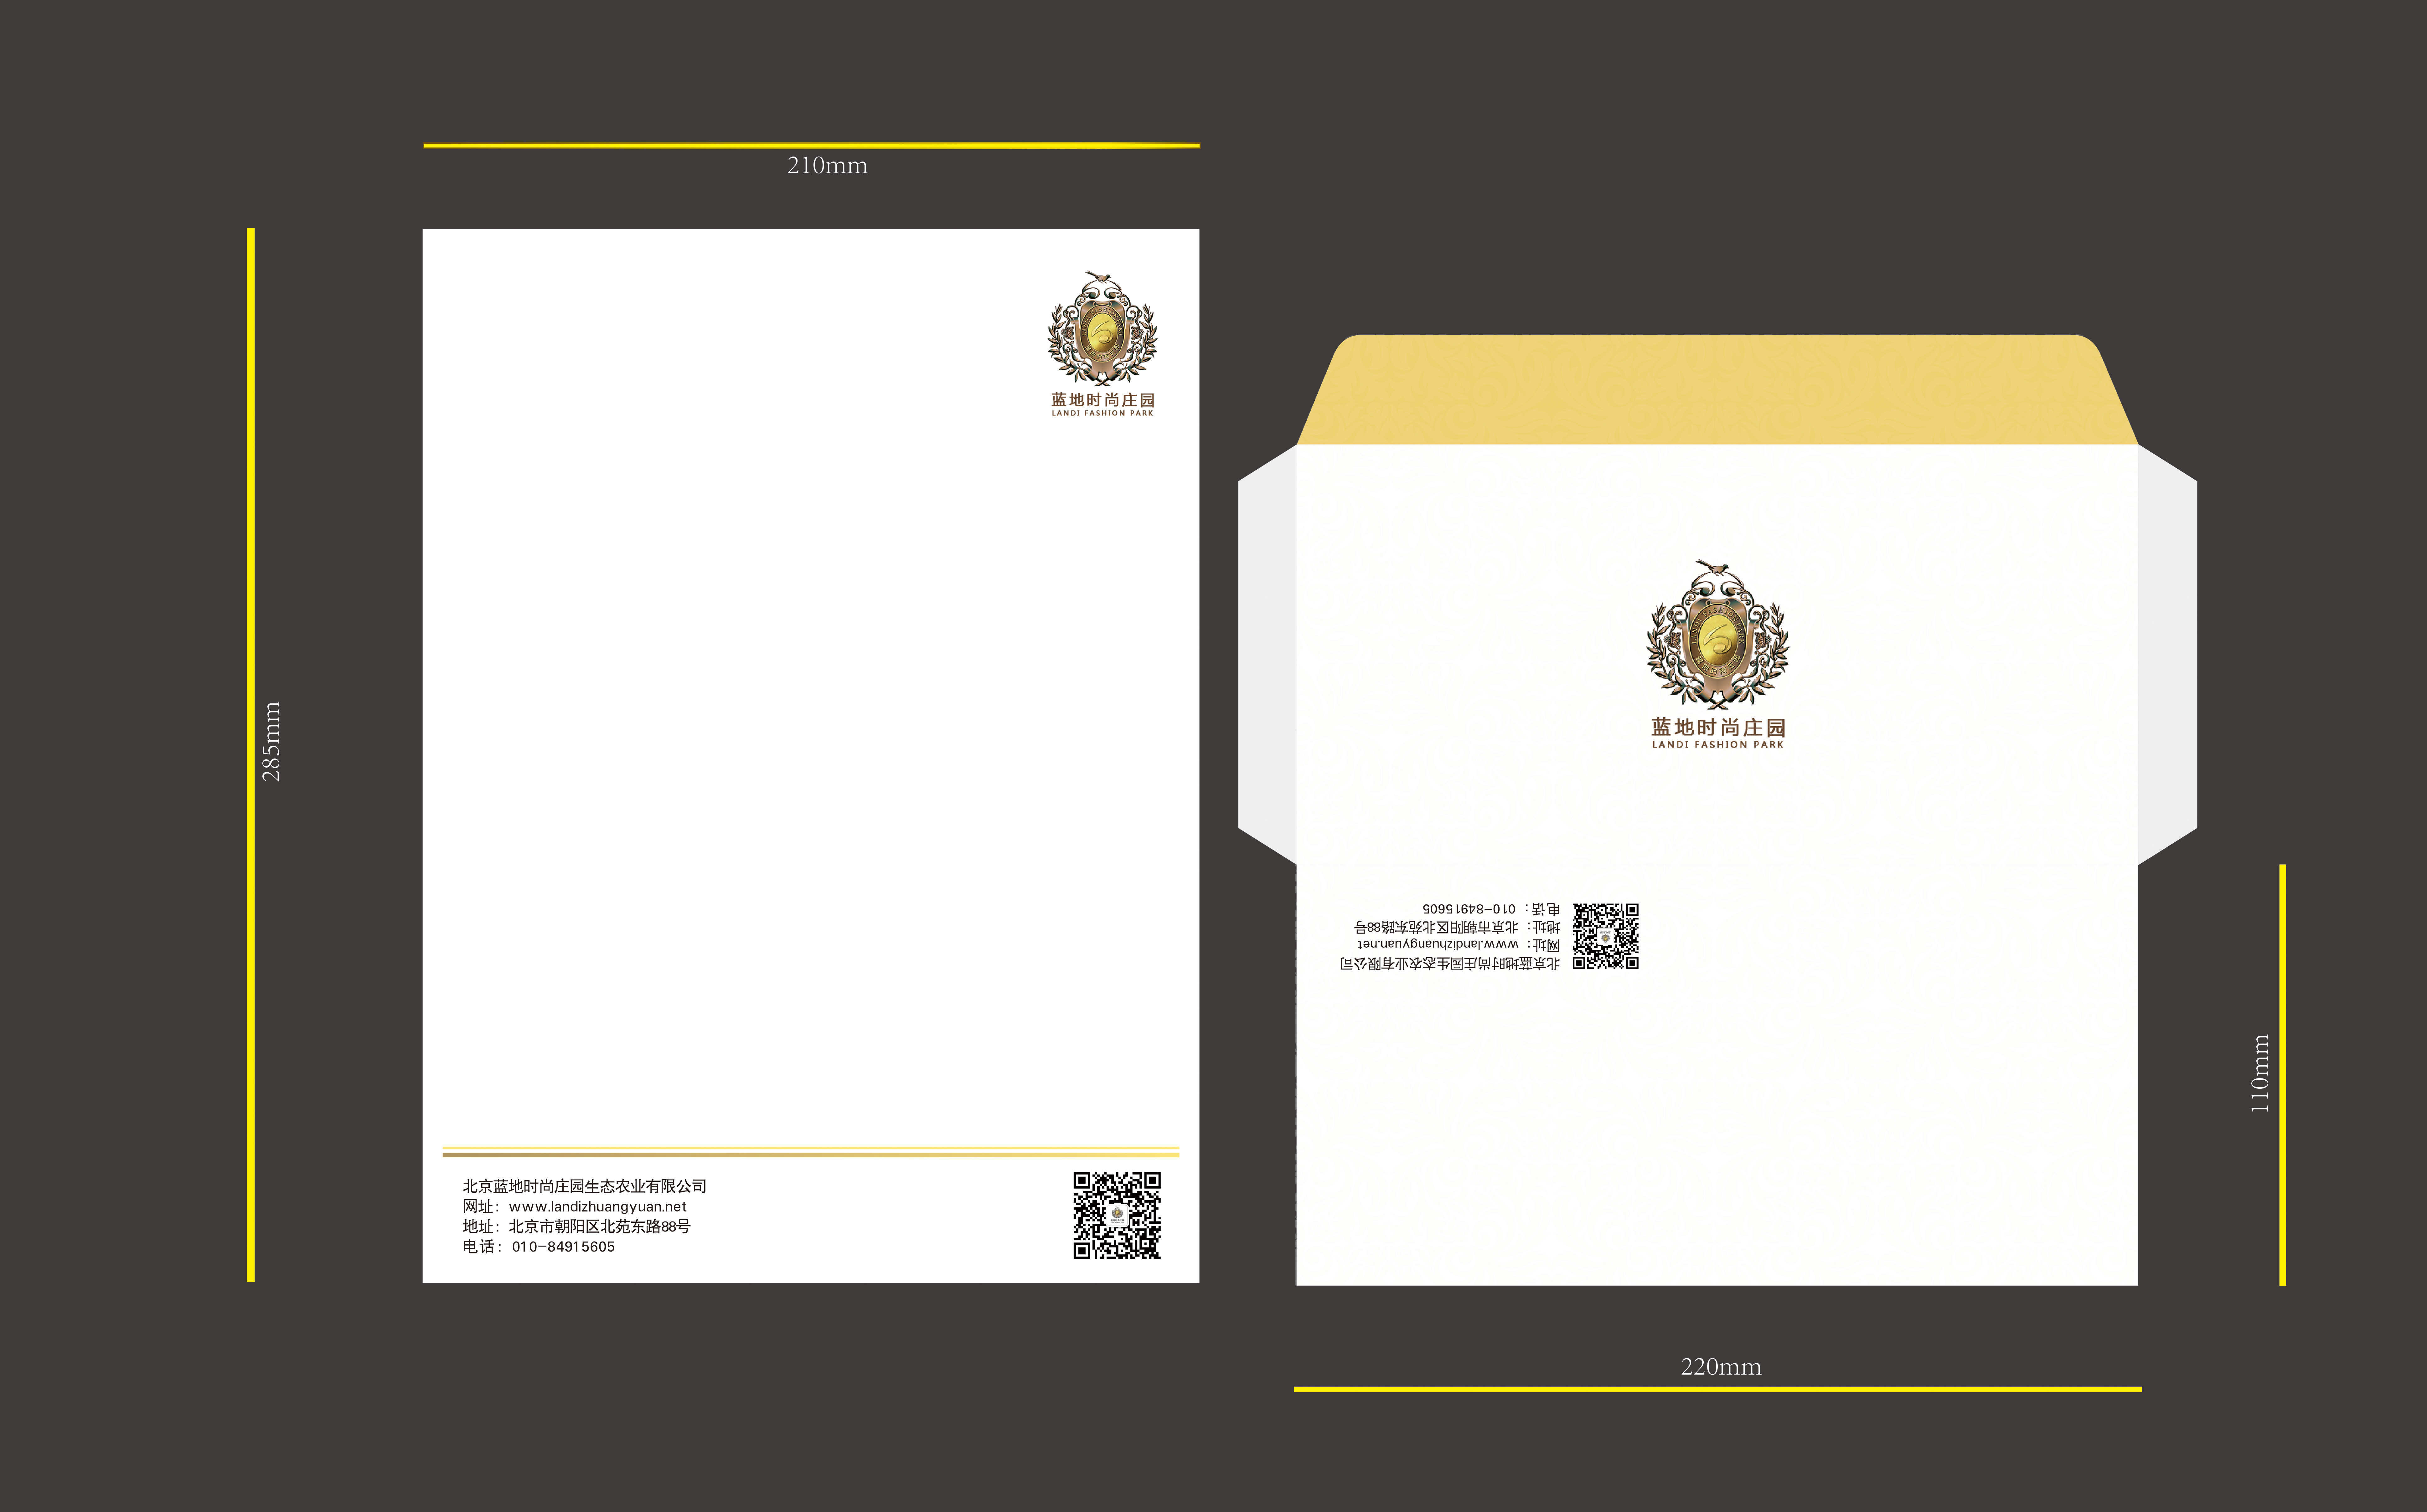 4444vi_蓝地时尚庄园vi设计信封信纸(基础系统)